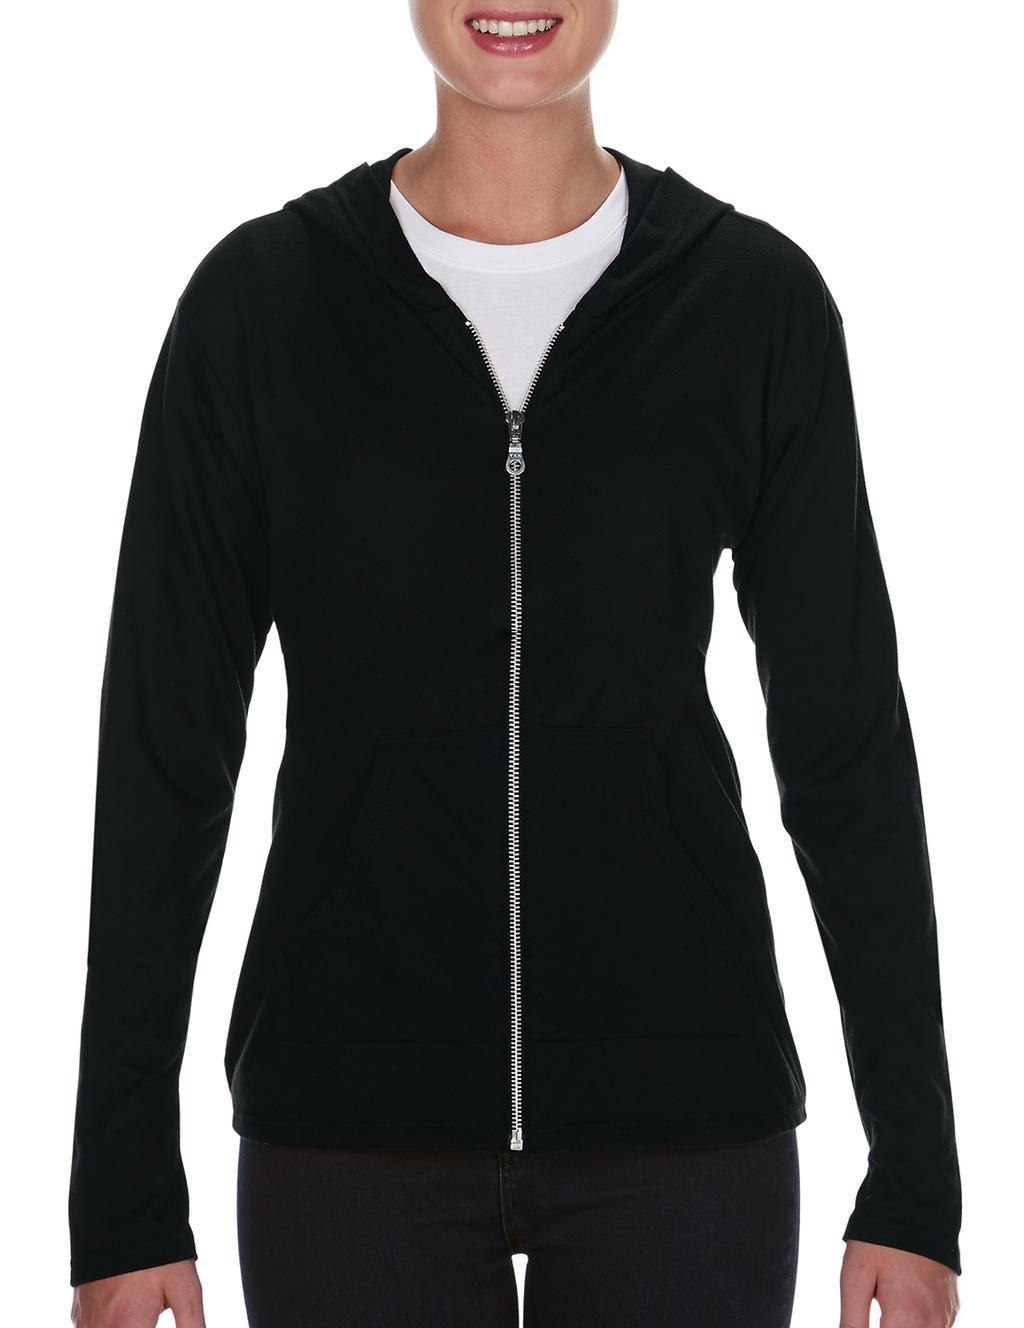 Anvil womens tri-blend full-zip hooded jacket zwart